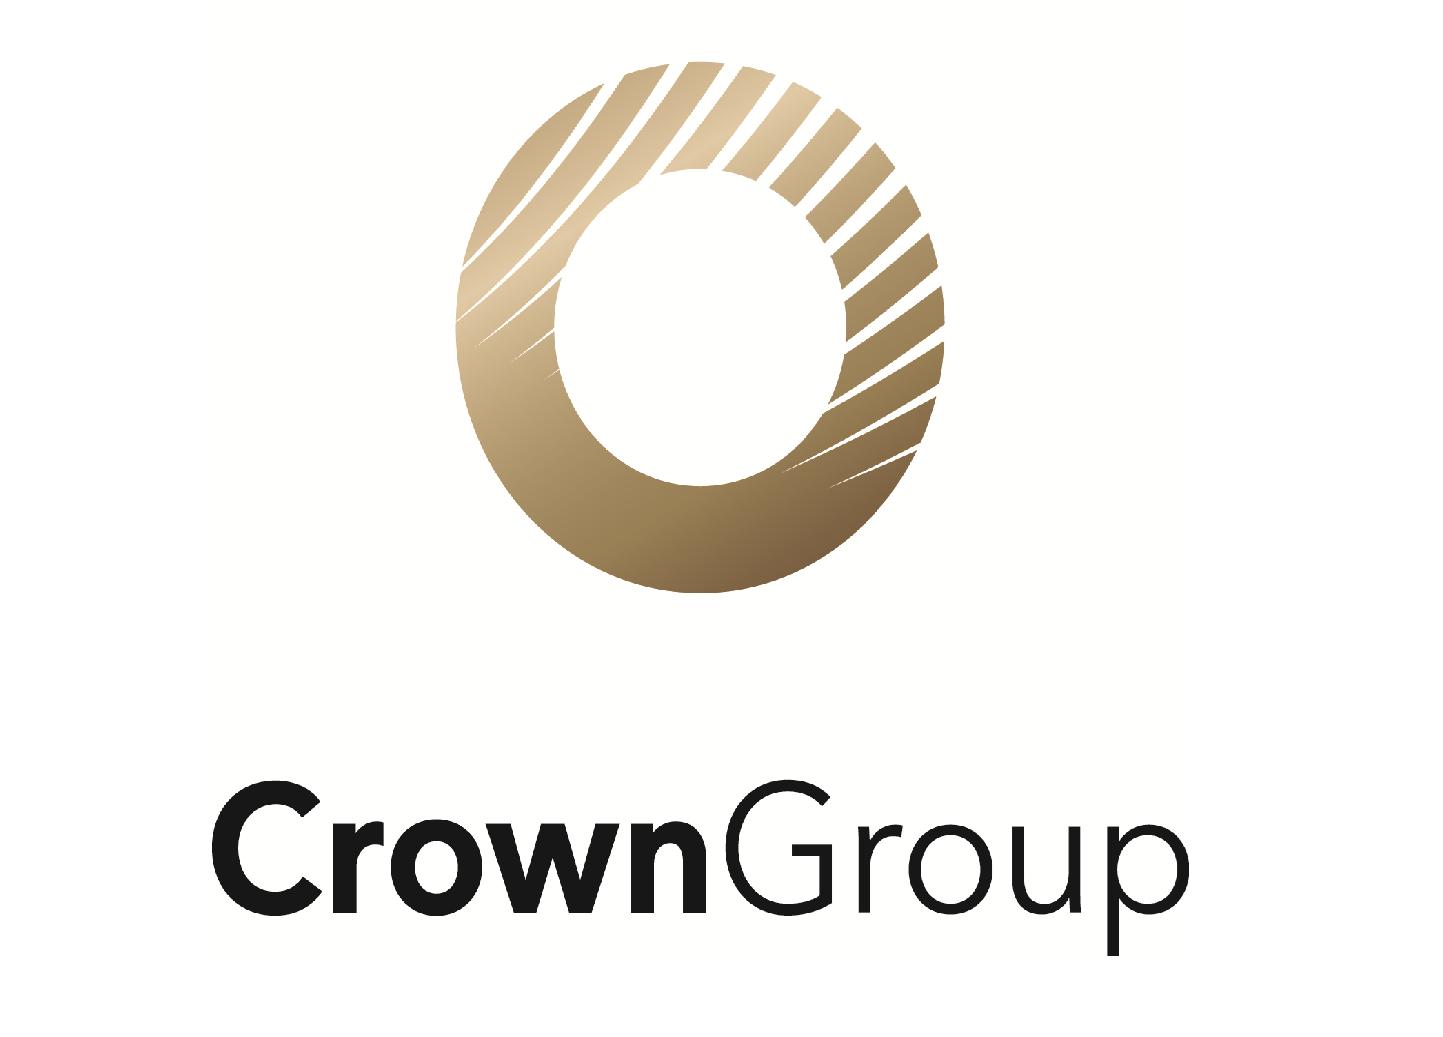 Crown Group _ARC BY CROWN GROUP의 SKITTLE PLACE, CBD의 부흥과 함께 리테일 업체 유치 개시